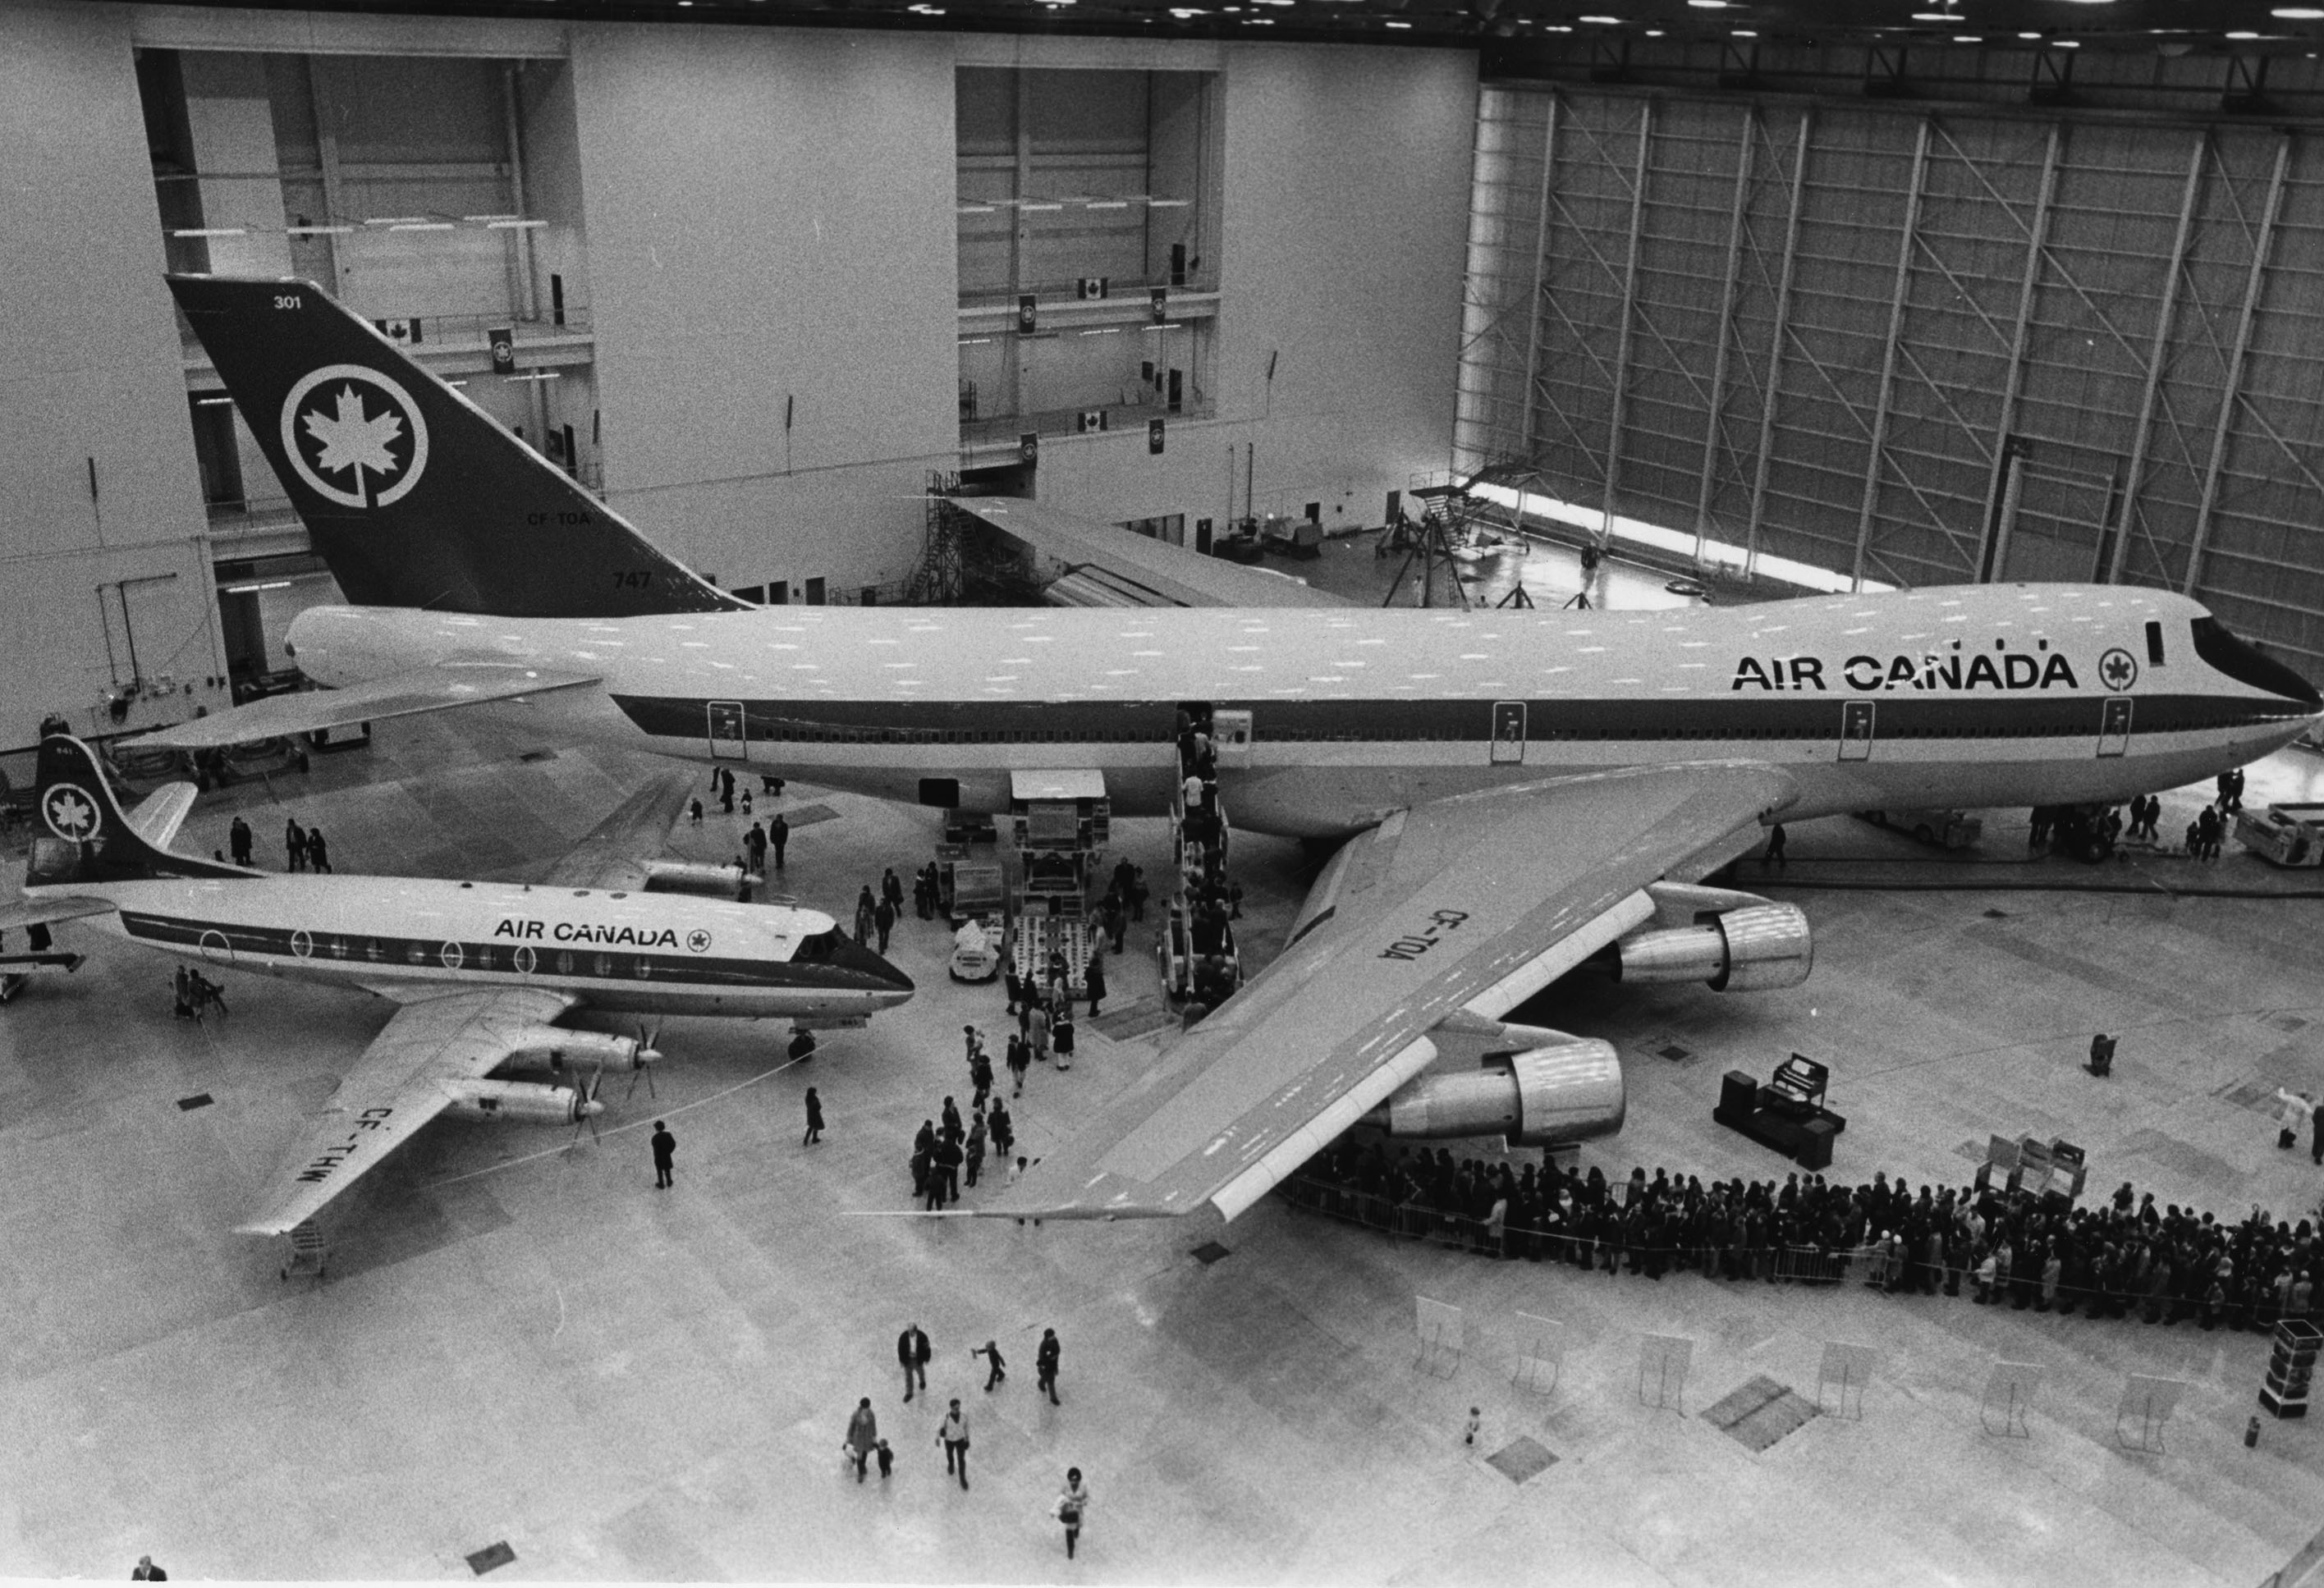 Five Ways Boeing S 747 Jumbo Jet Changed Travel Wingborn Ltd